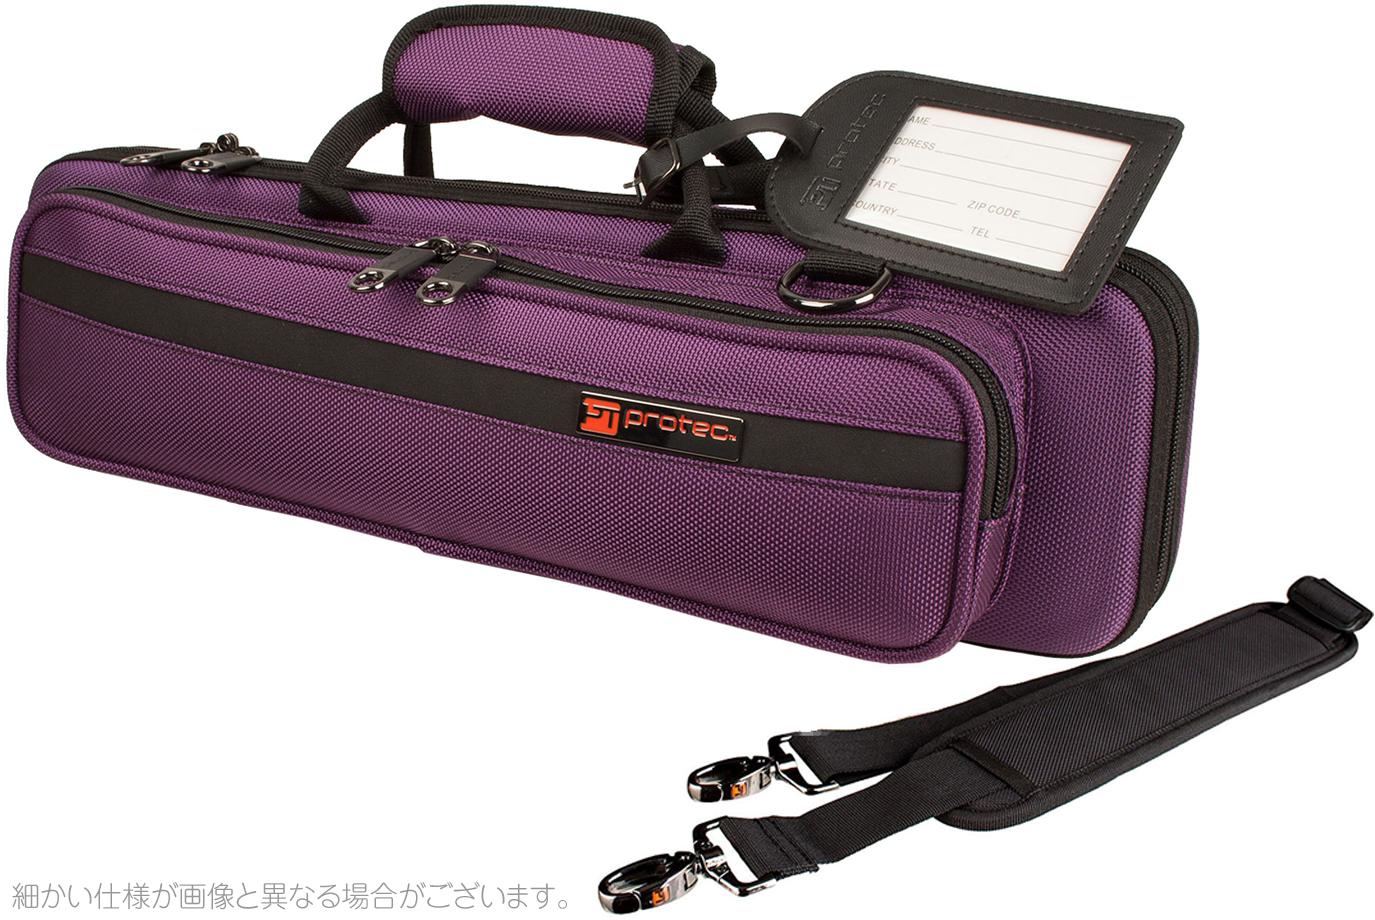 PROTEC ( プロテック ) PB-308 Purplre フルートケース パープル C管 H管 セミハードケース ショルダータイプ 管楽器 ケース フルート用 flute PRO PAC case 紫色